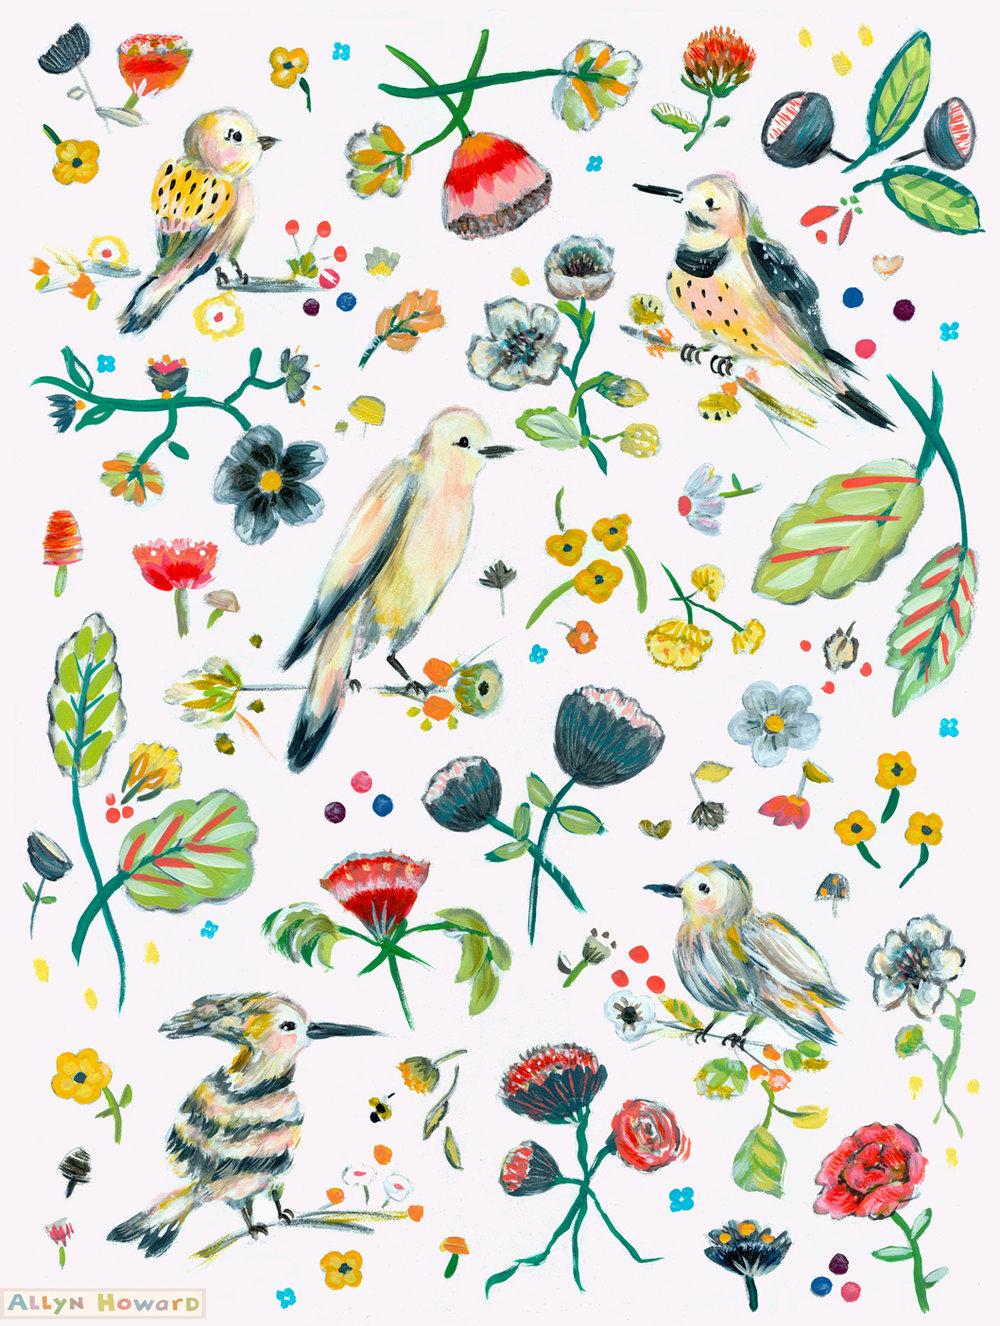 Allyn_Howard_Birds-Botanica_19.jpg